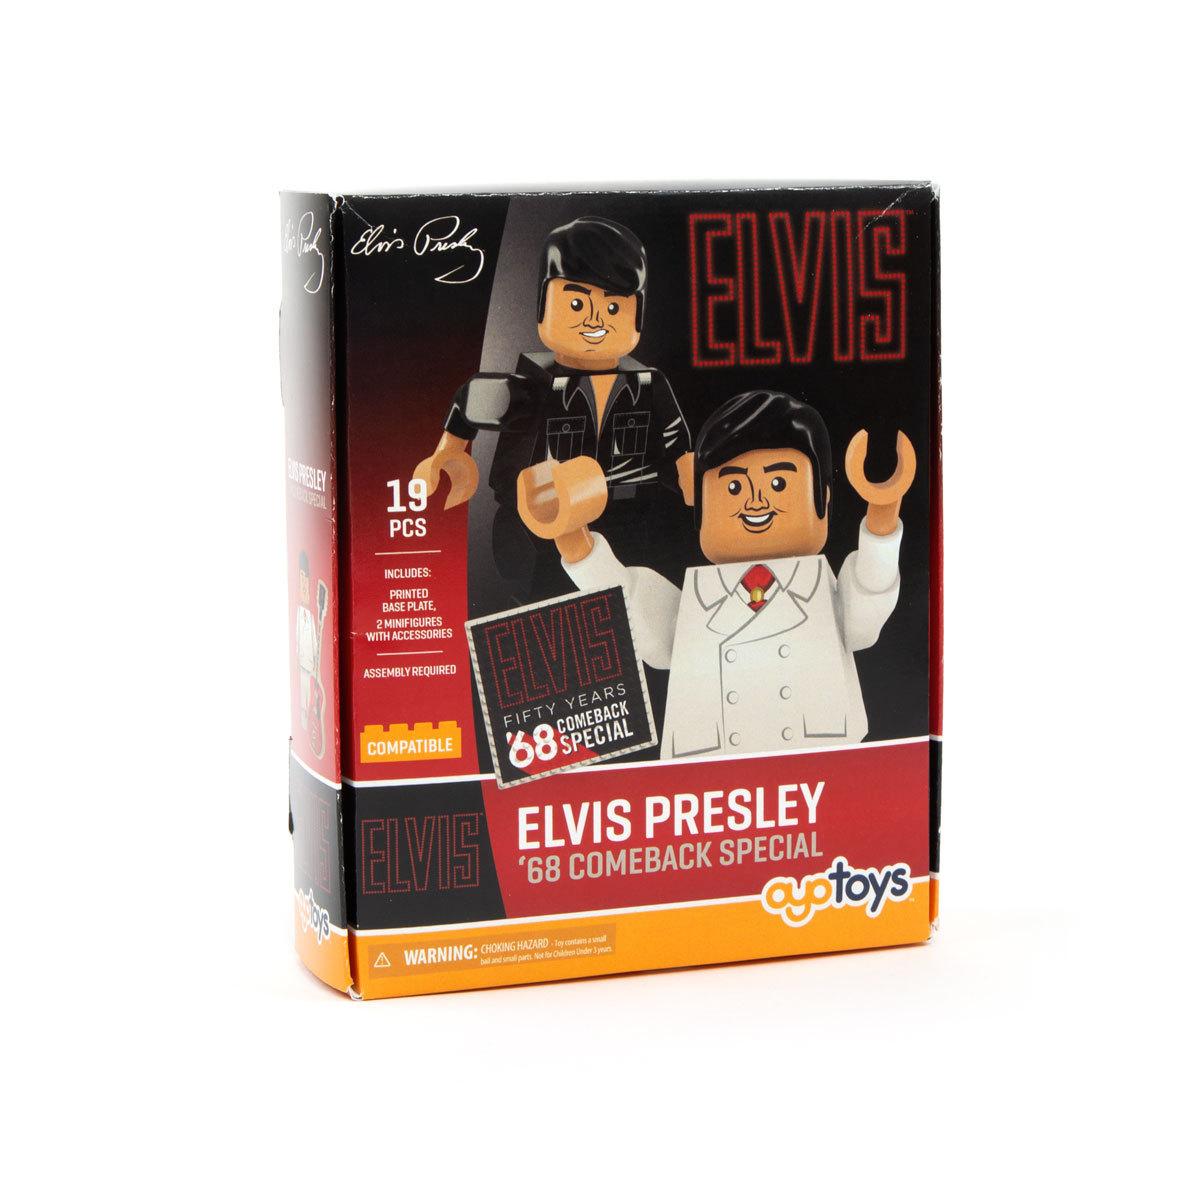 Elvis Presley 68 Comeback Minifigure 2pk